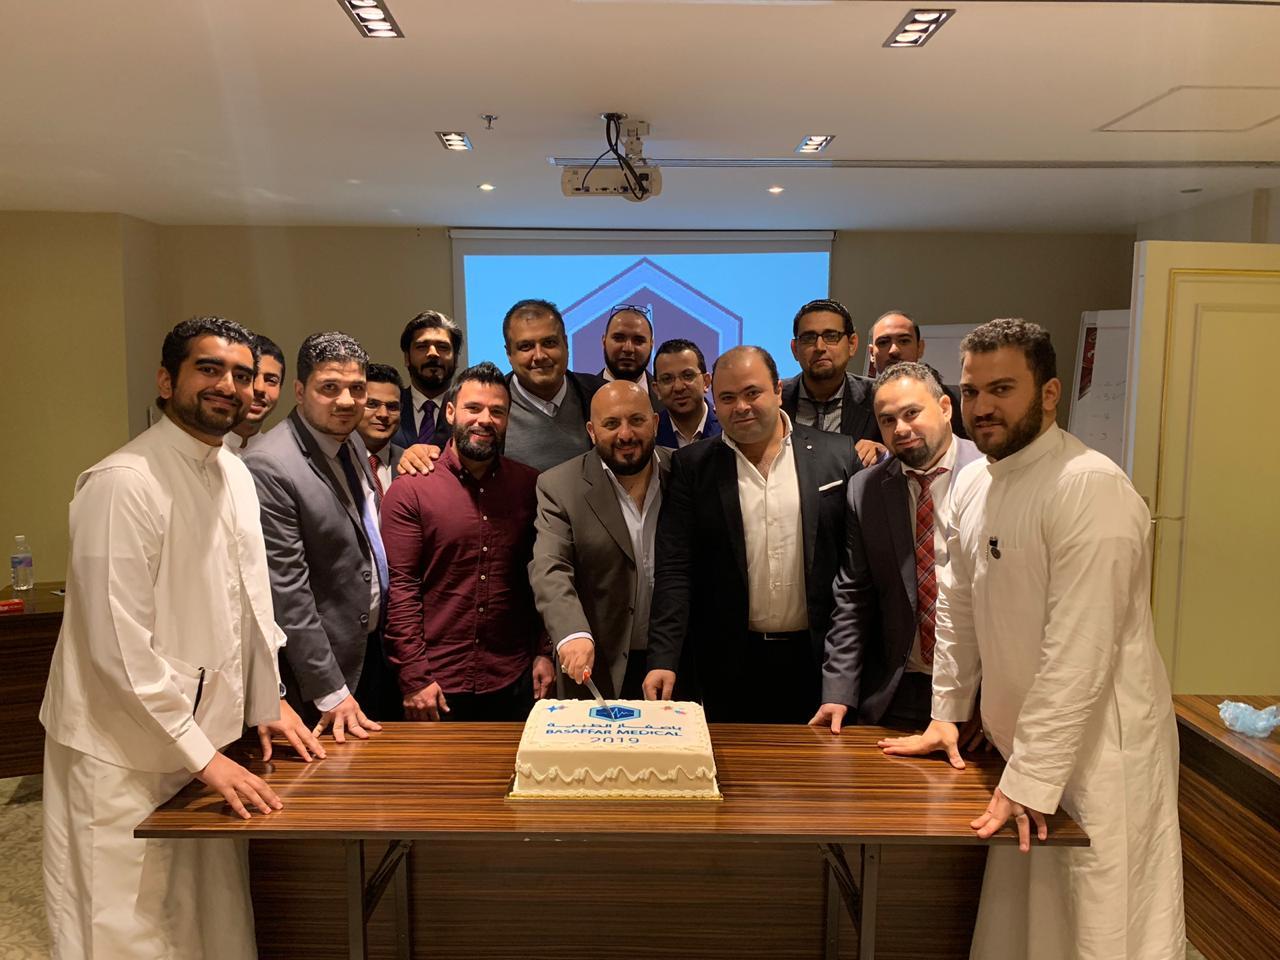 BME 2019 kick-start meeting